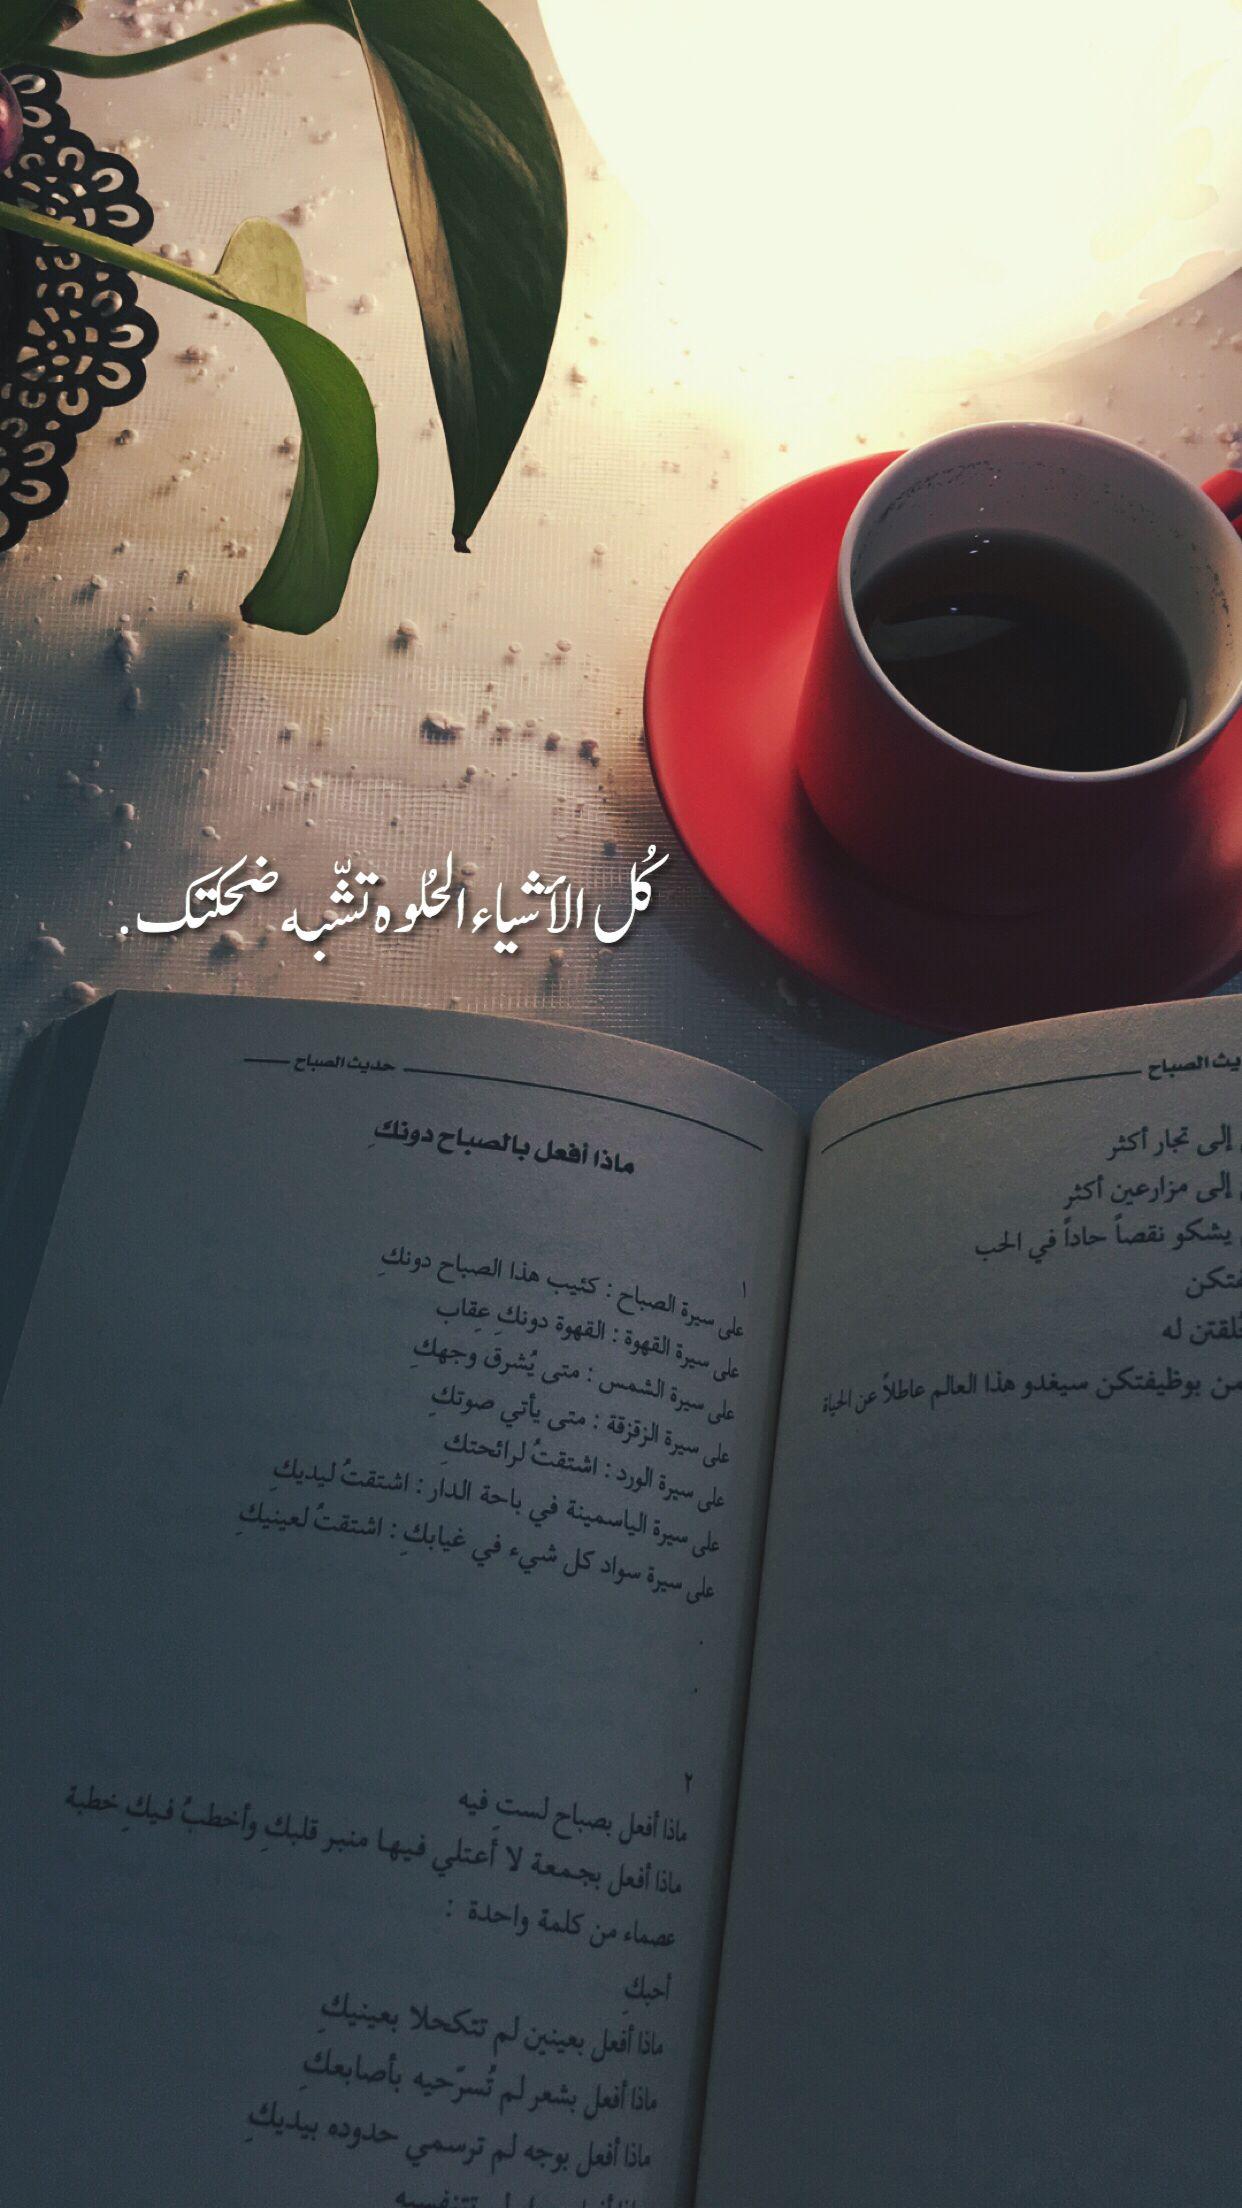 Pin By Sura Sr4 On قهوة قهوتي قهوة الصباح Coffee Cool Words Love Words Words